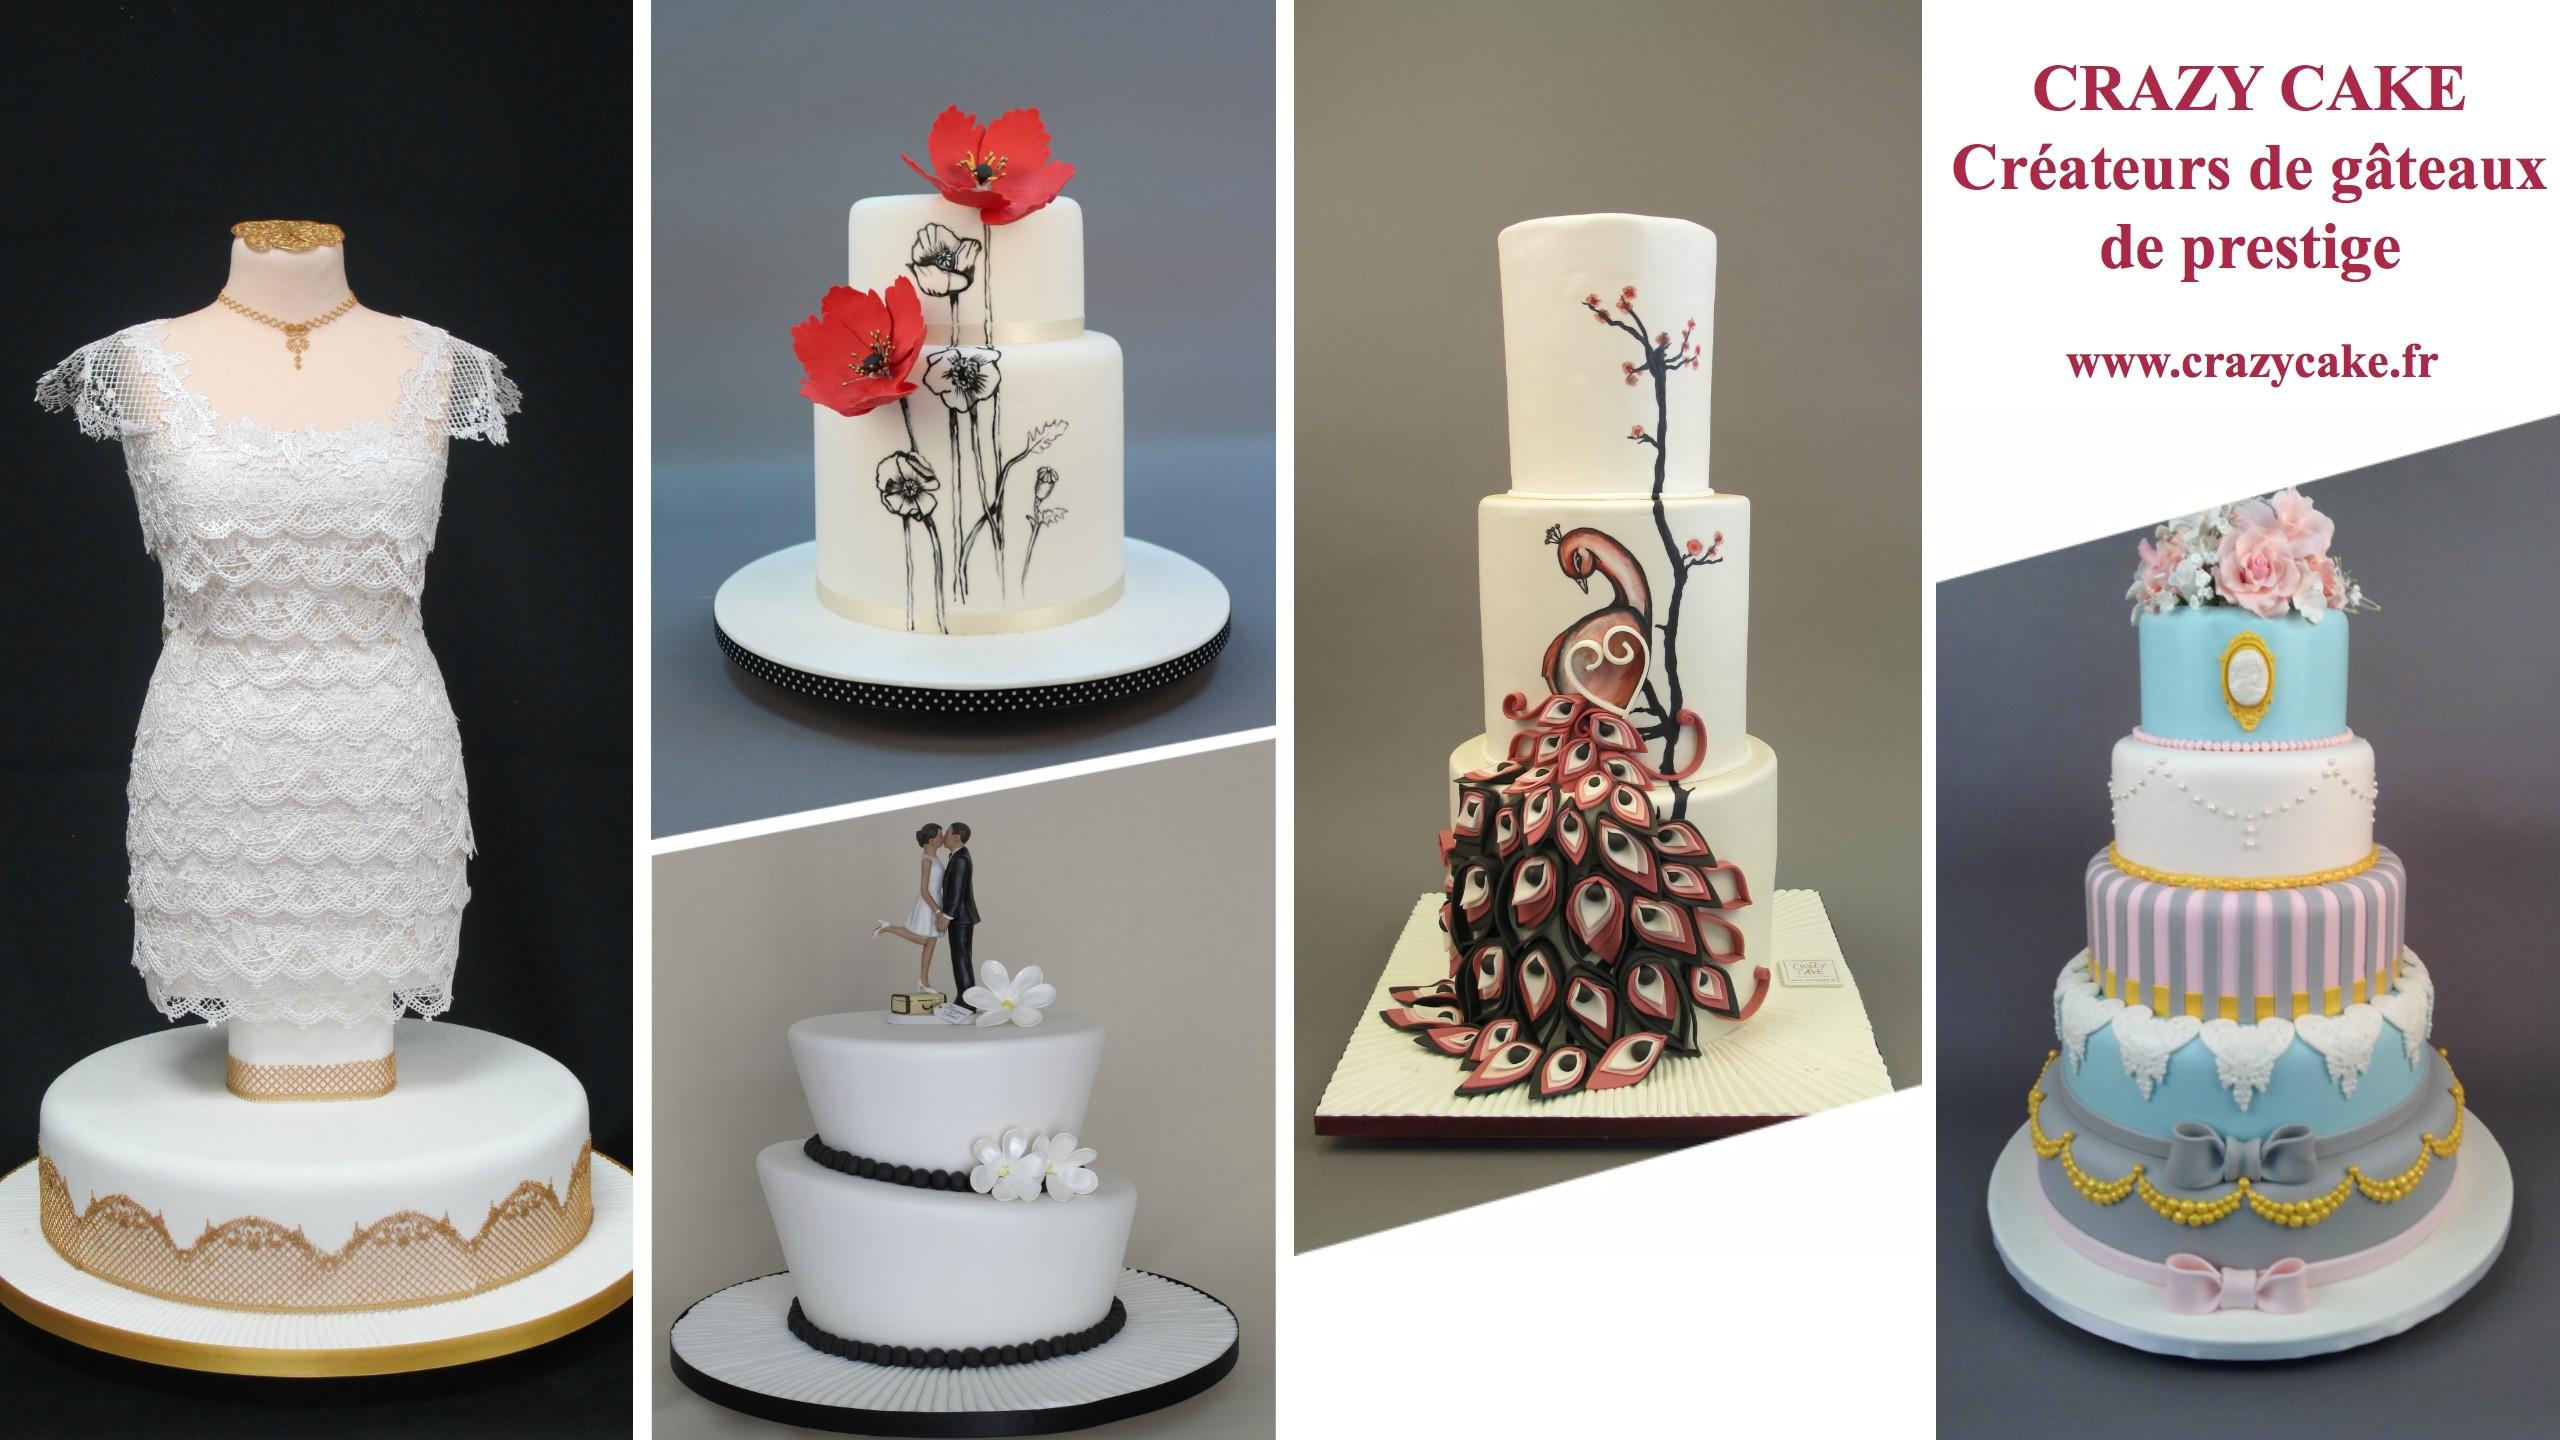 crazy cake - Traiteur Mariage Moselle